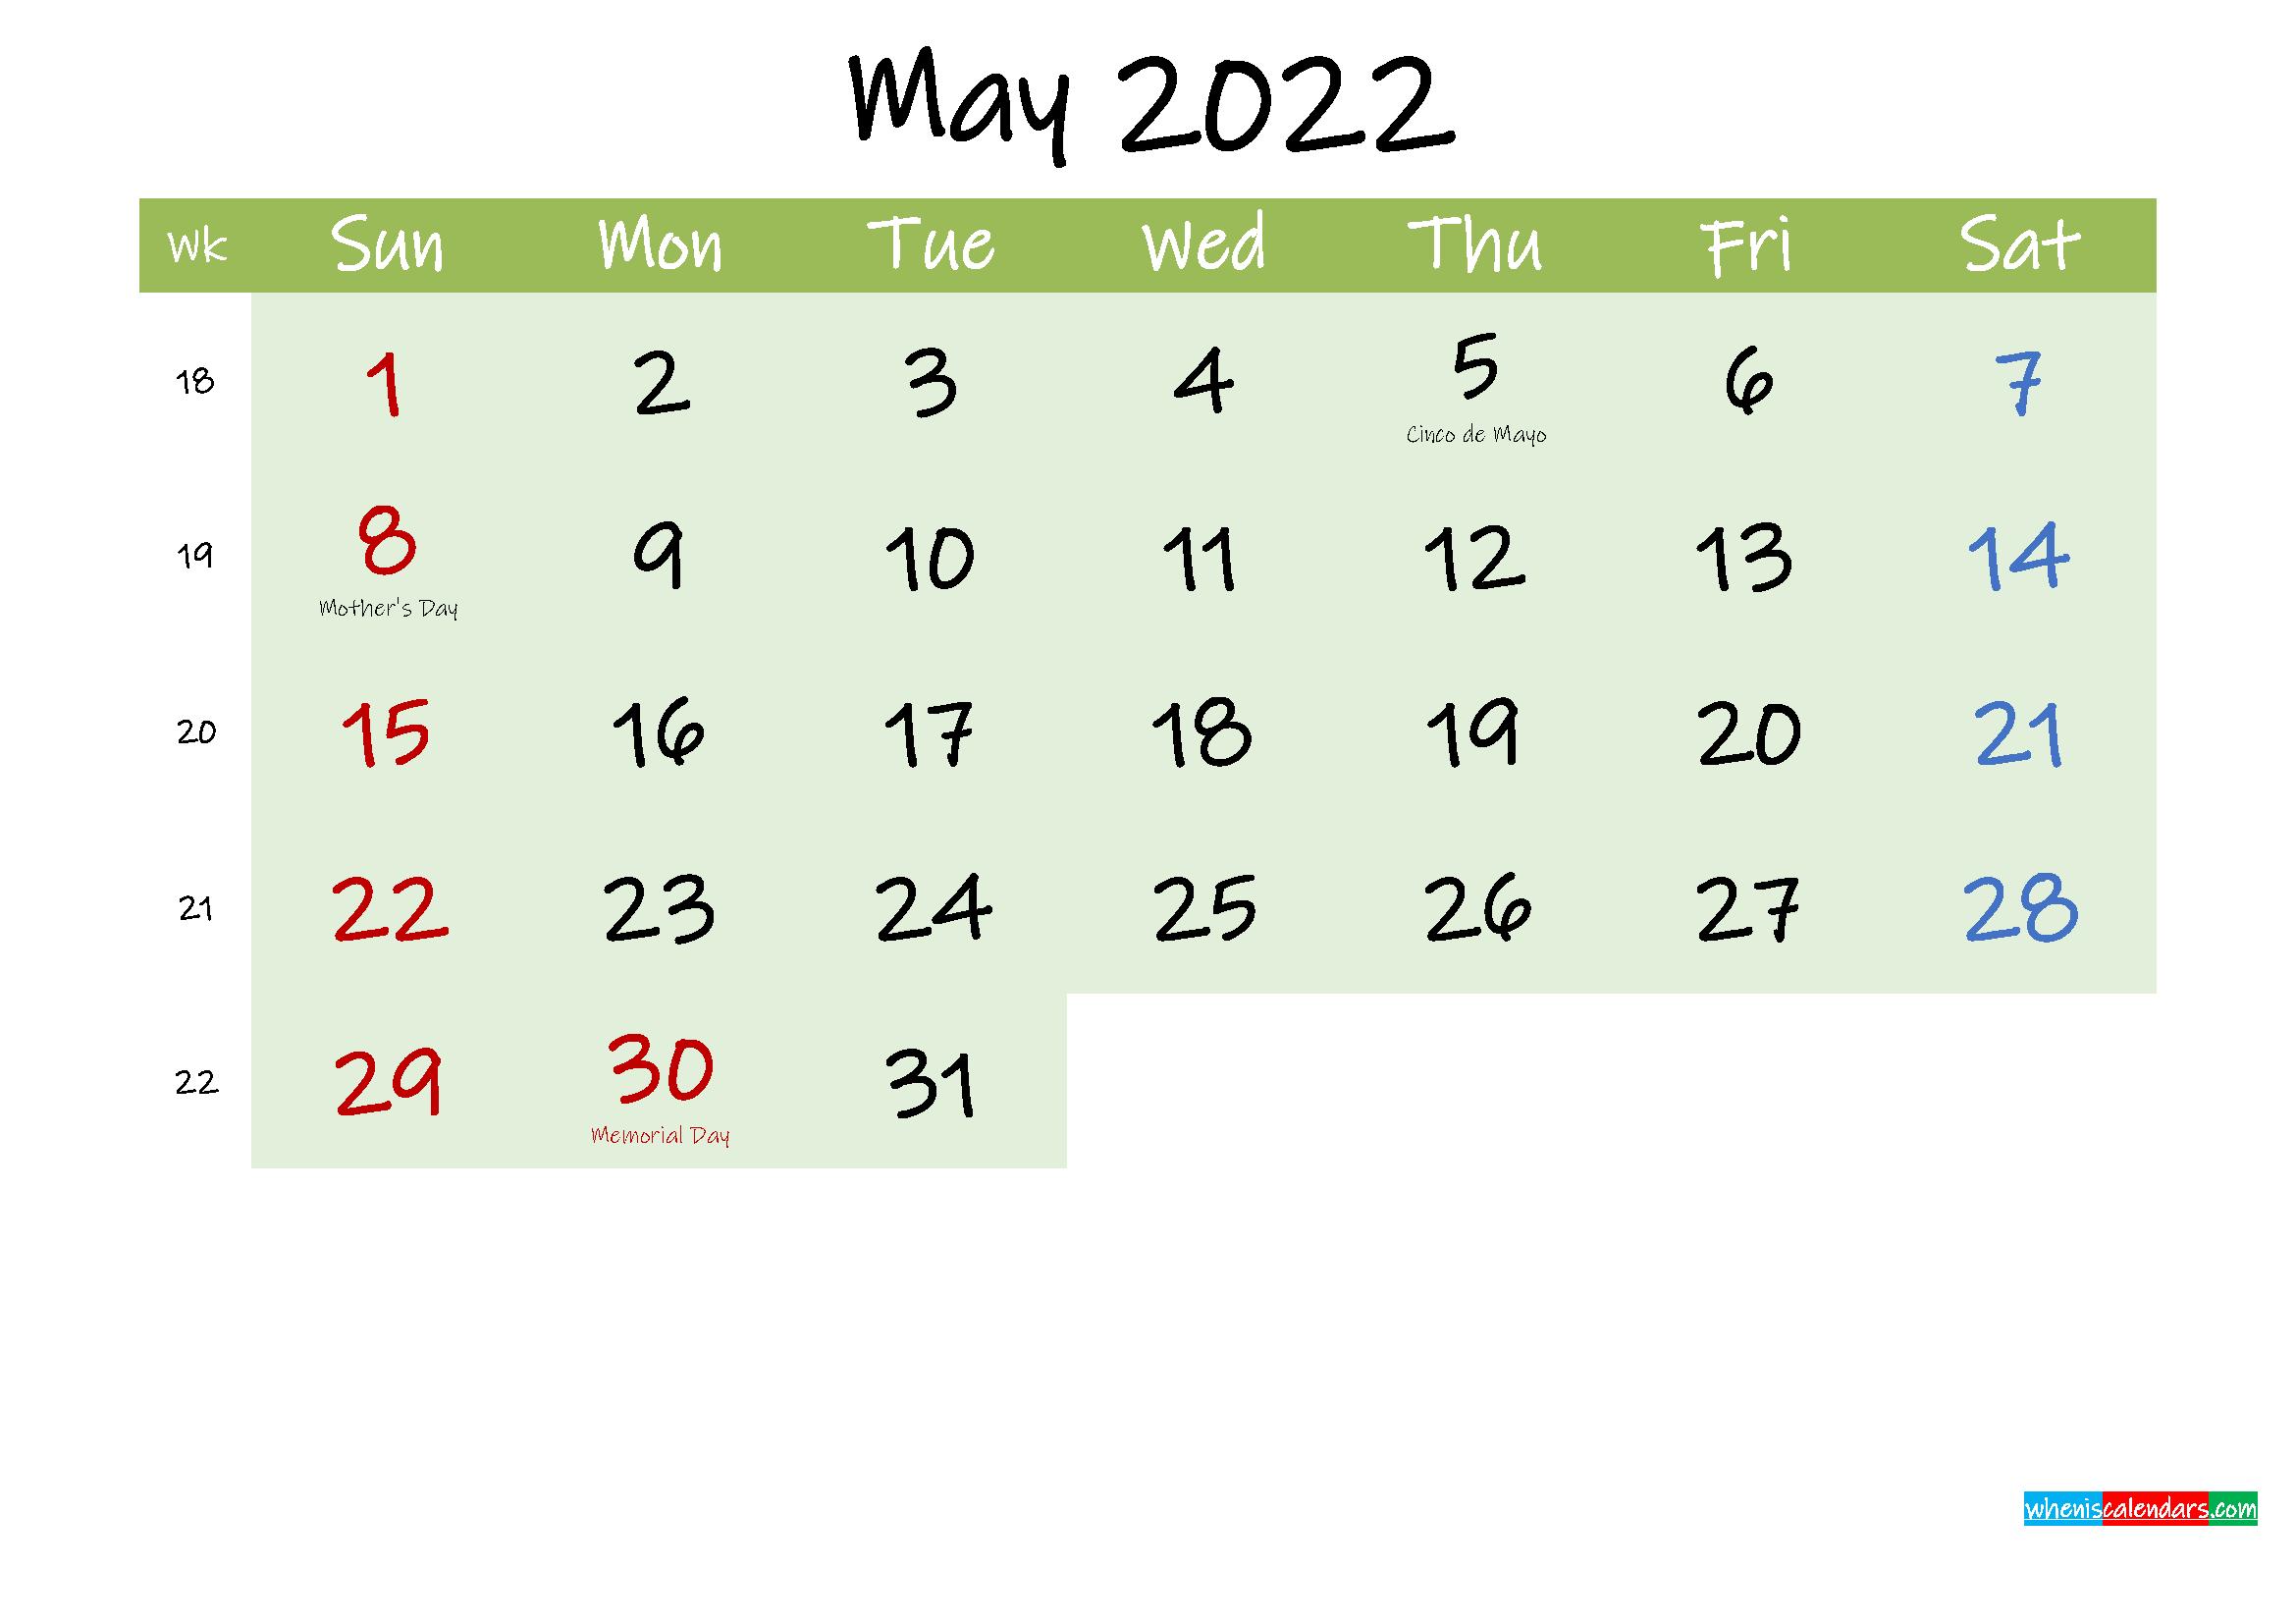 May 2022 Calendar with Holidays Printable